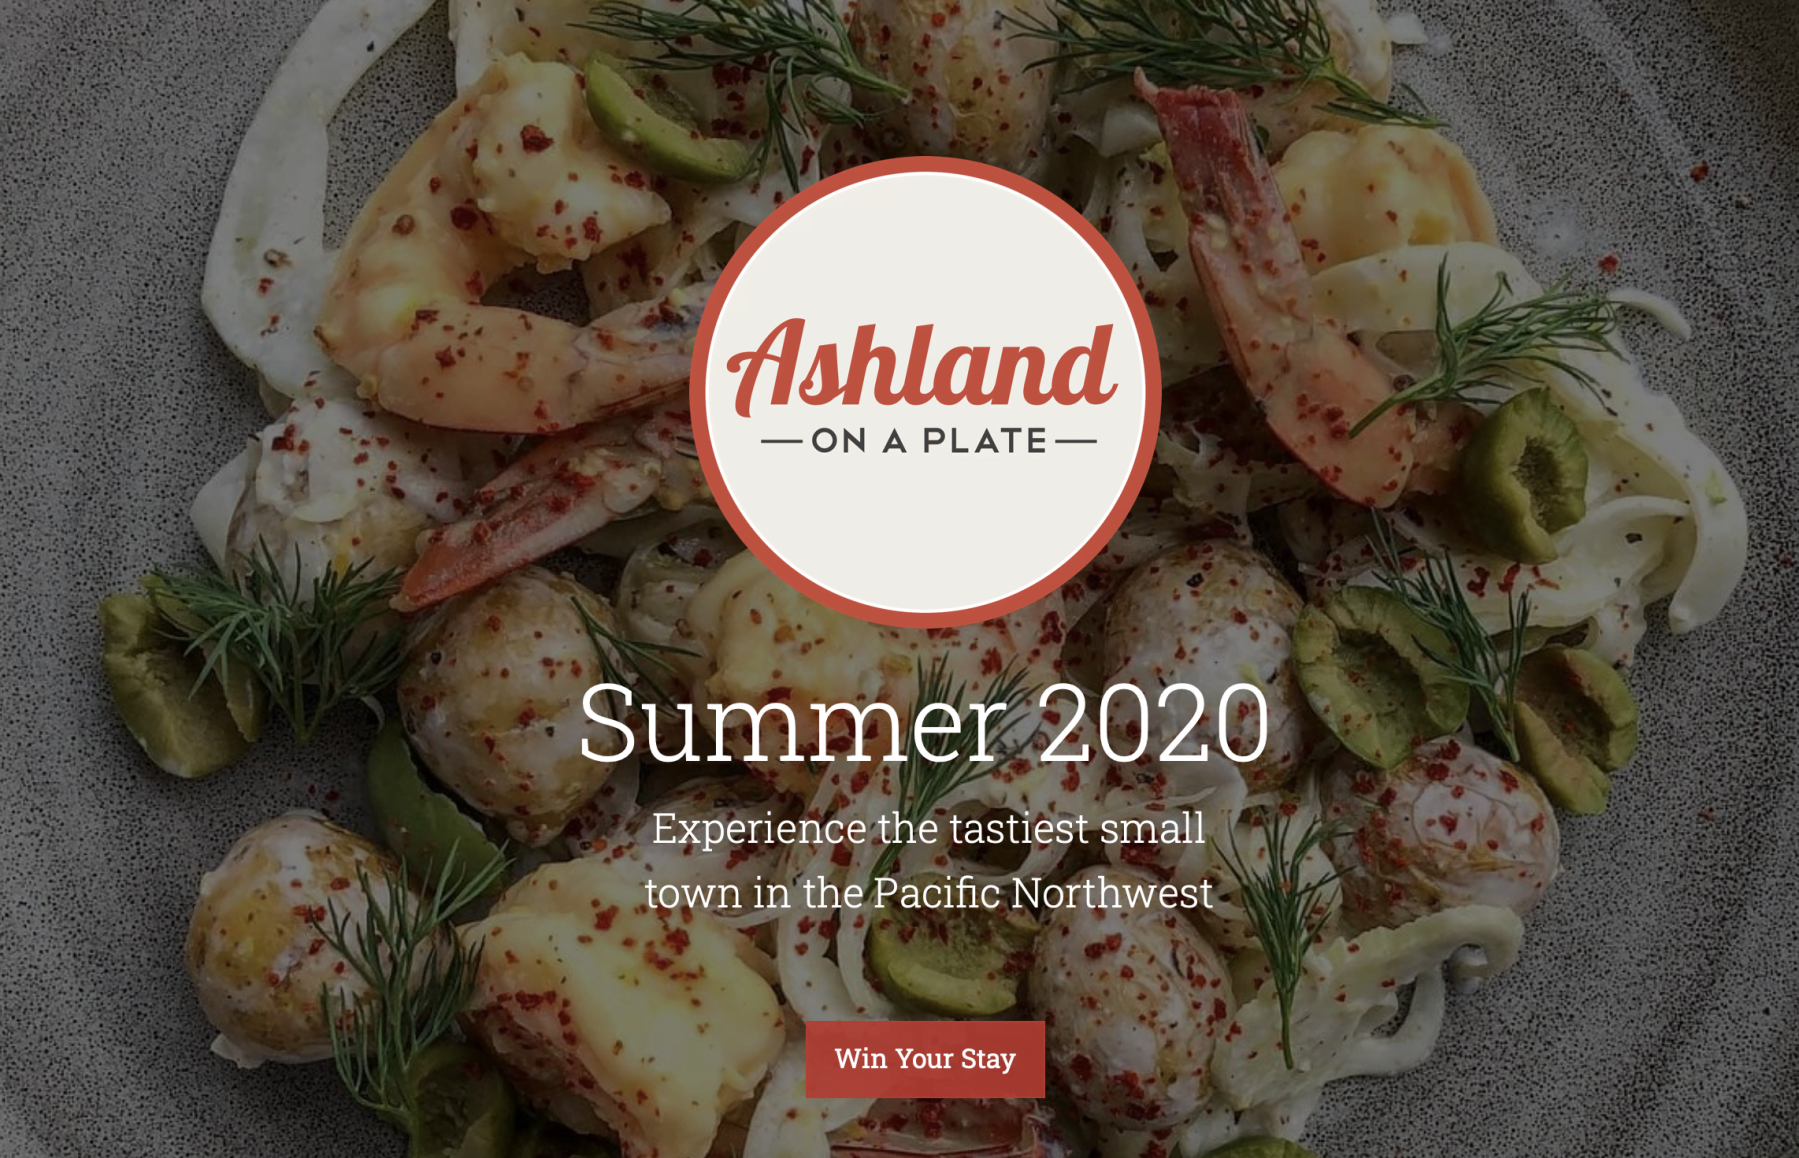 Ashland on a plate